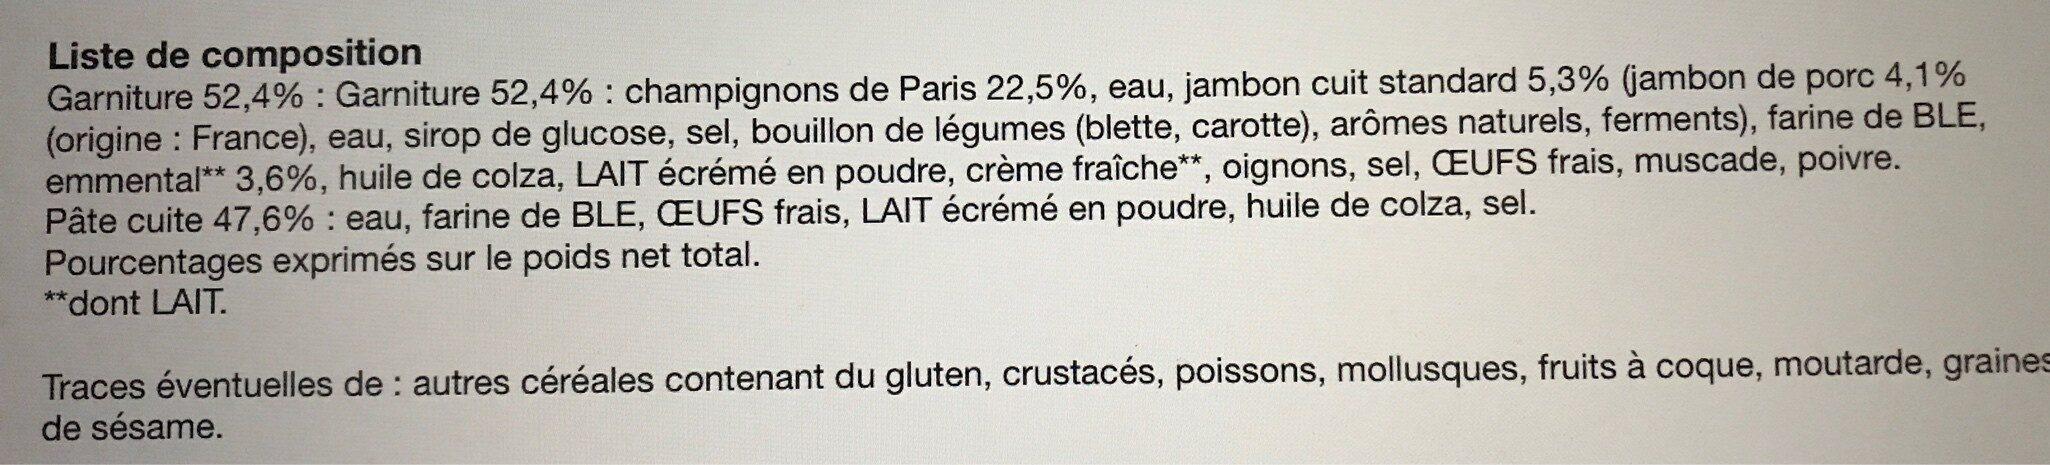 Crêpes champignons jambon & emmental - Ingrédients - fr